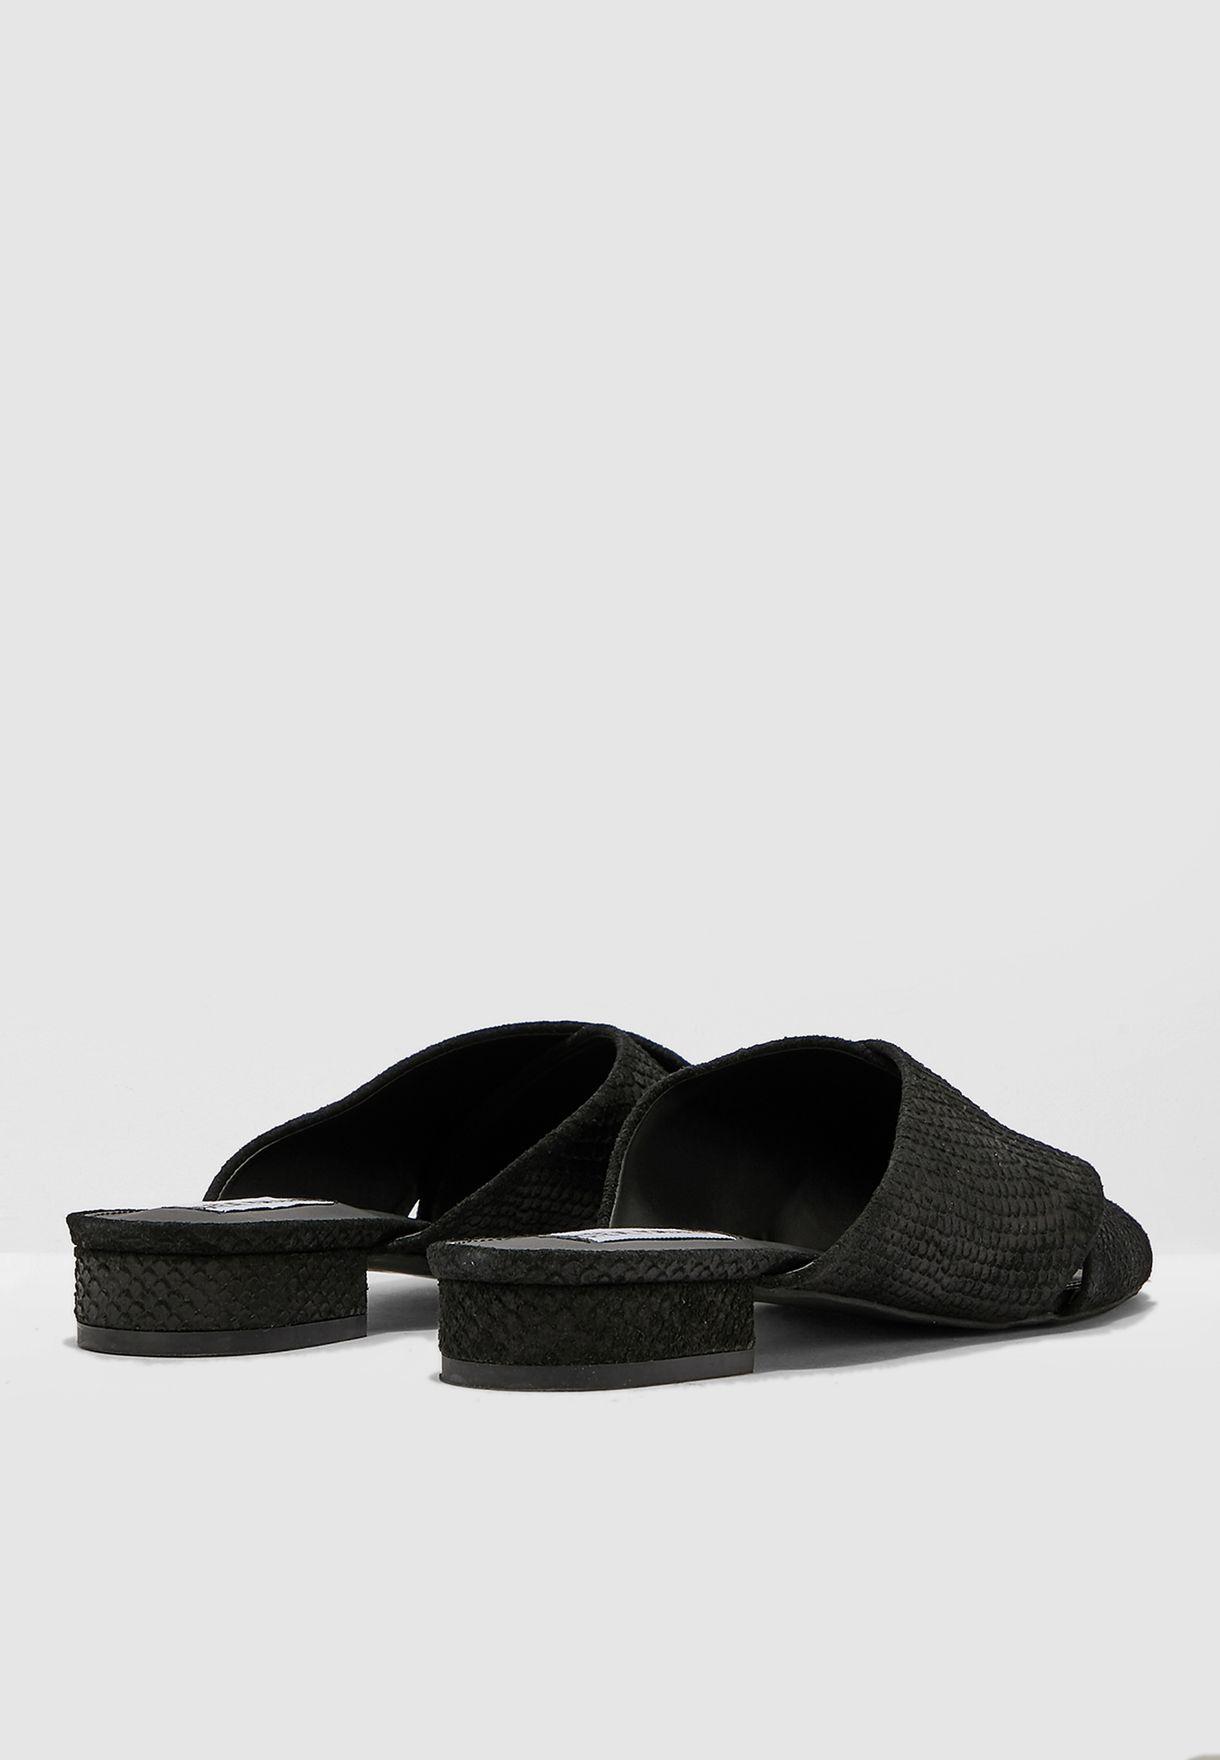 Jaxon Sandal - Black